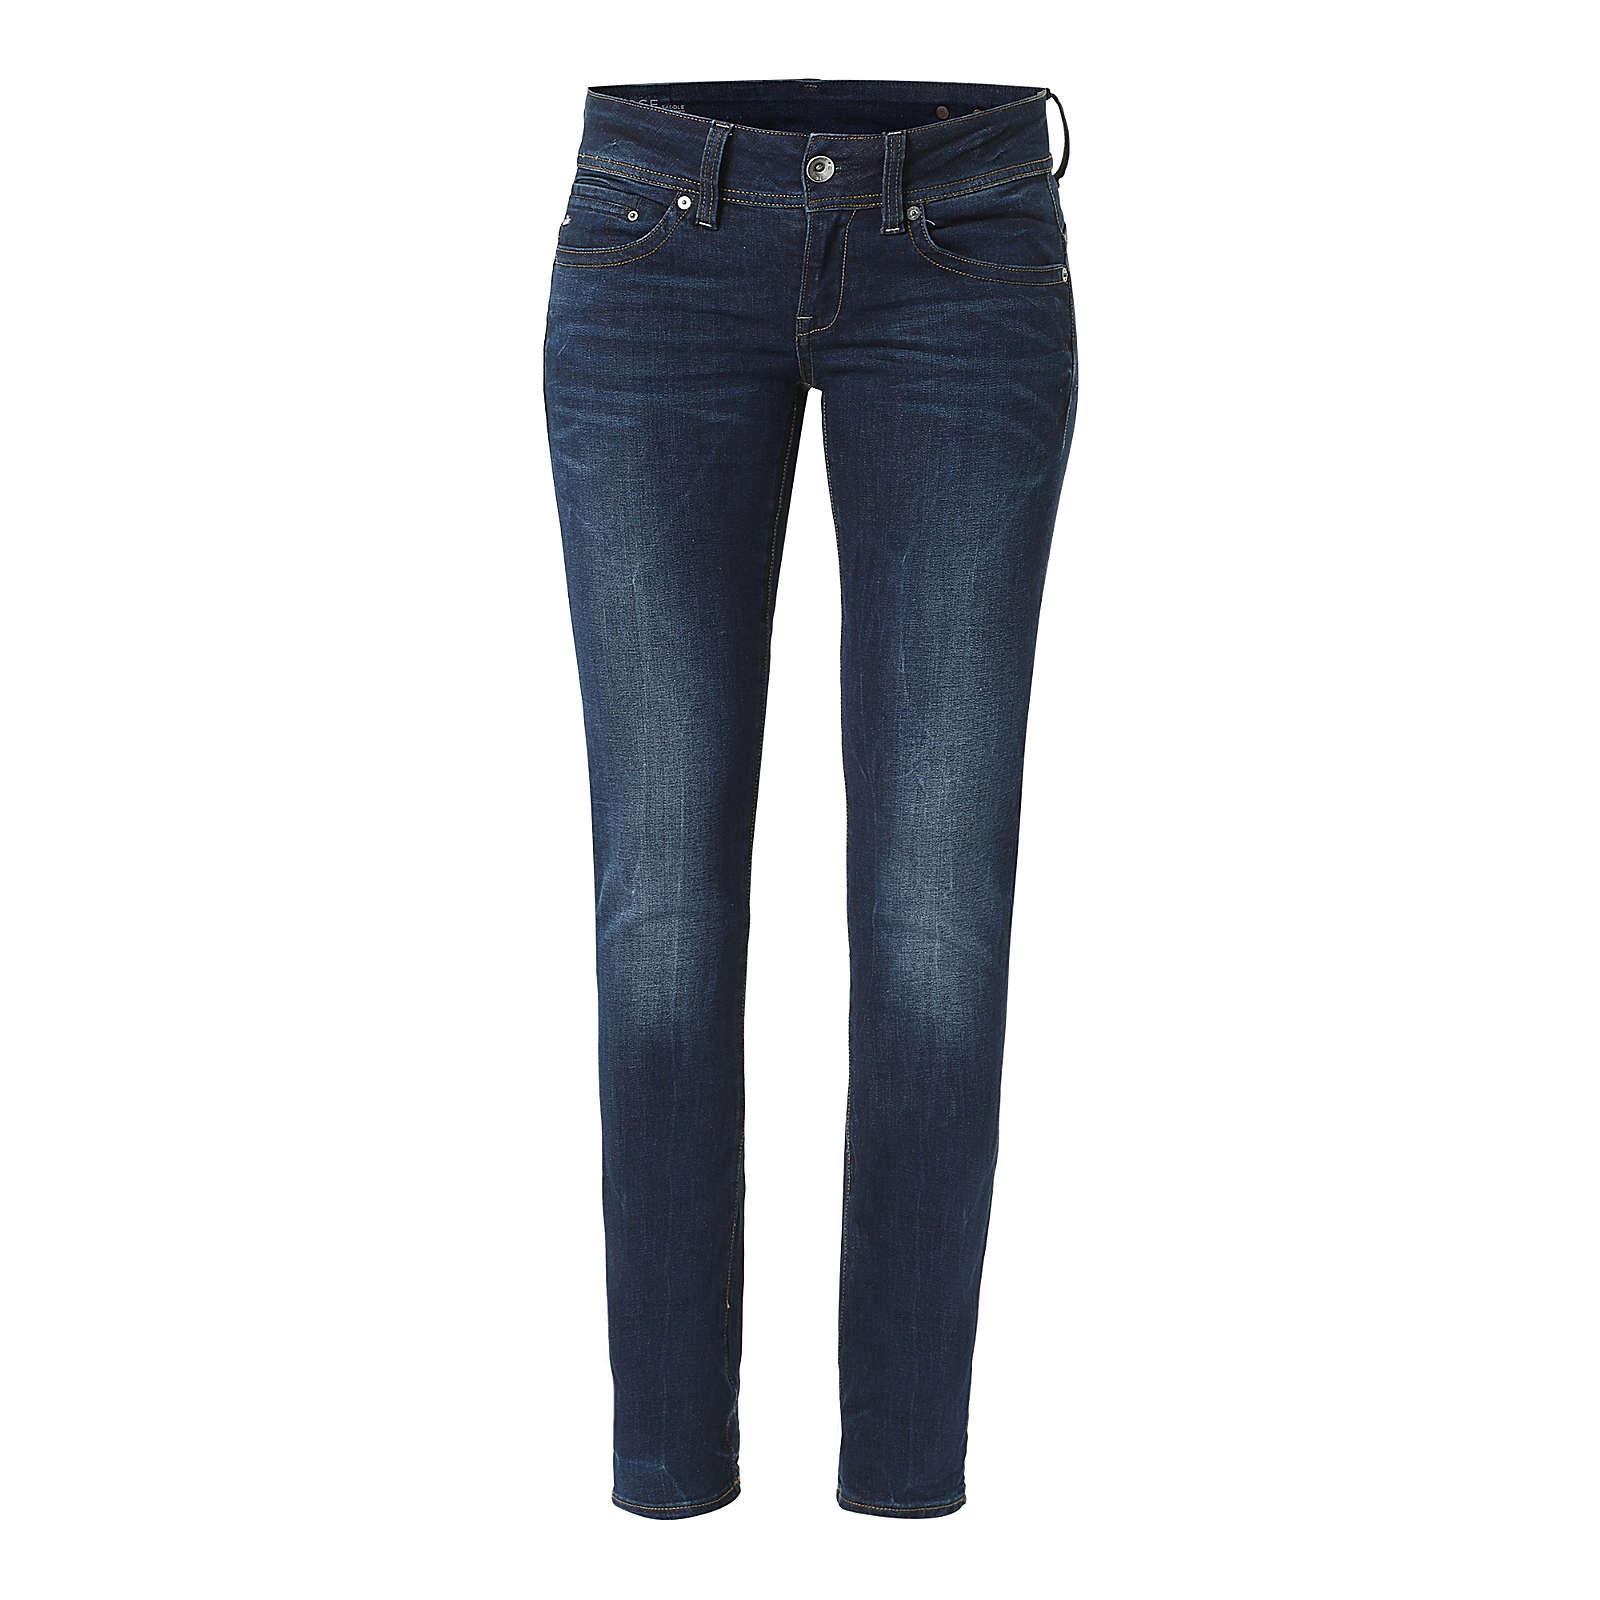 G-STAR RAW Jeans Midge Saddle Mid Straight Jeanshosen blau Damen Gr. W31/L30